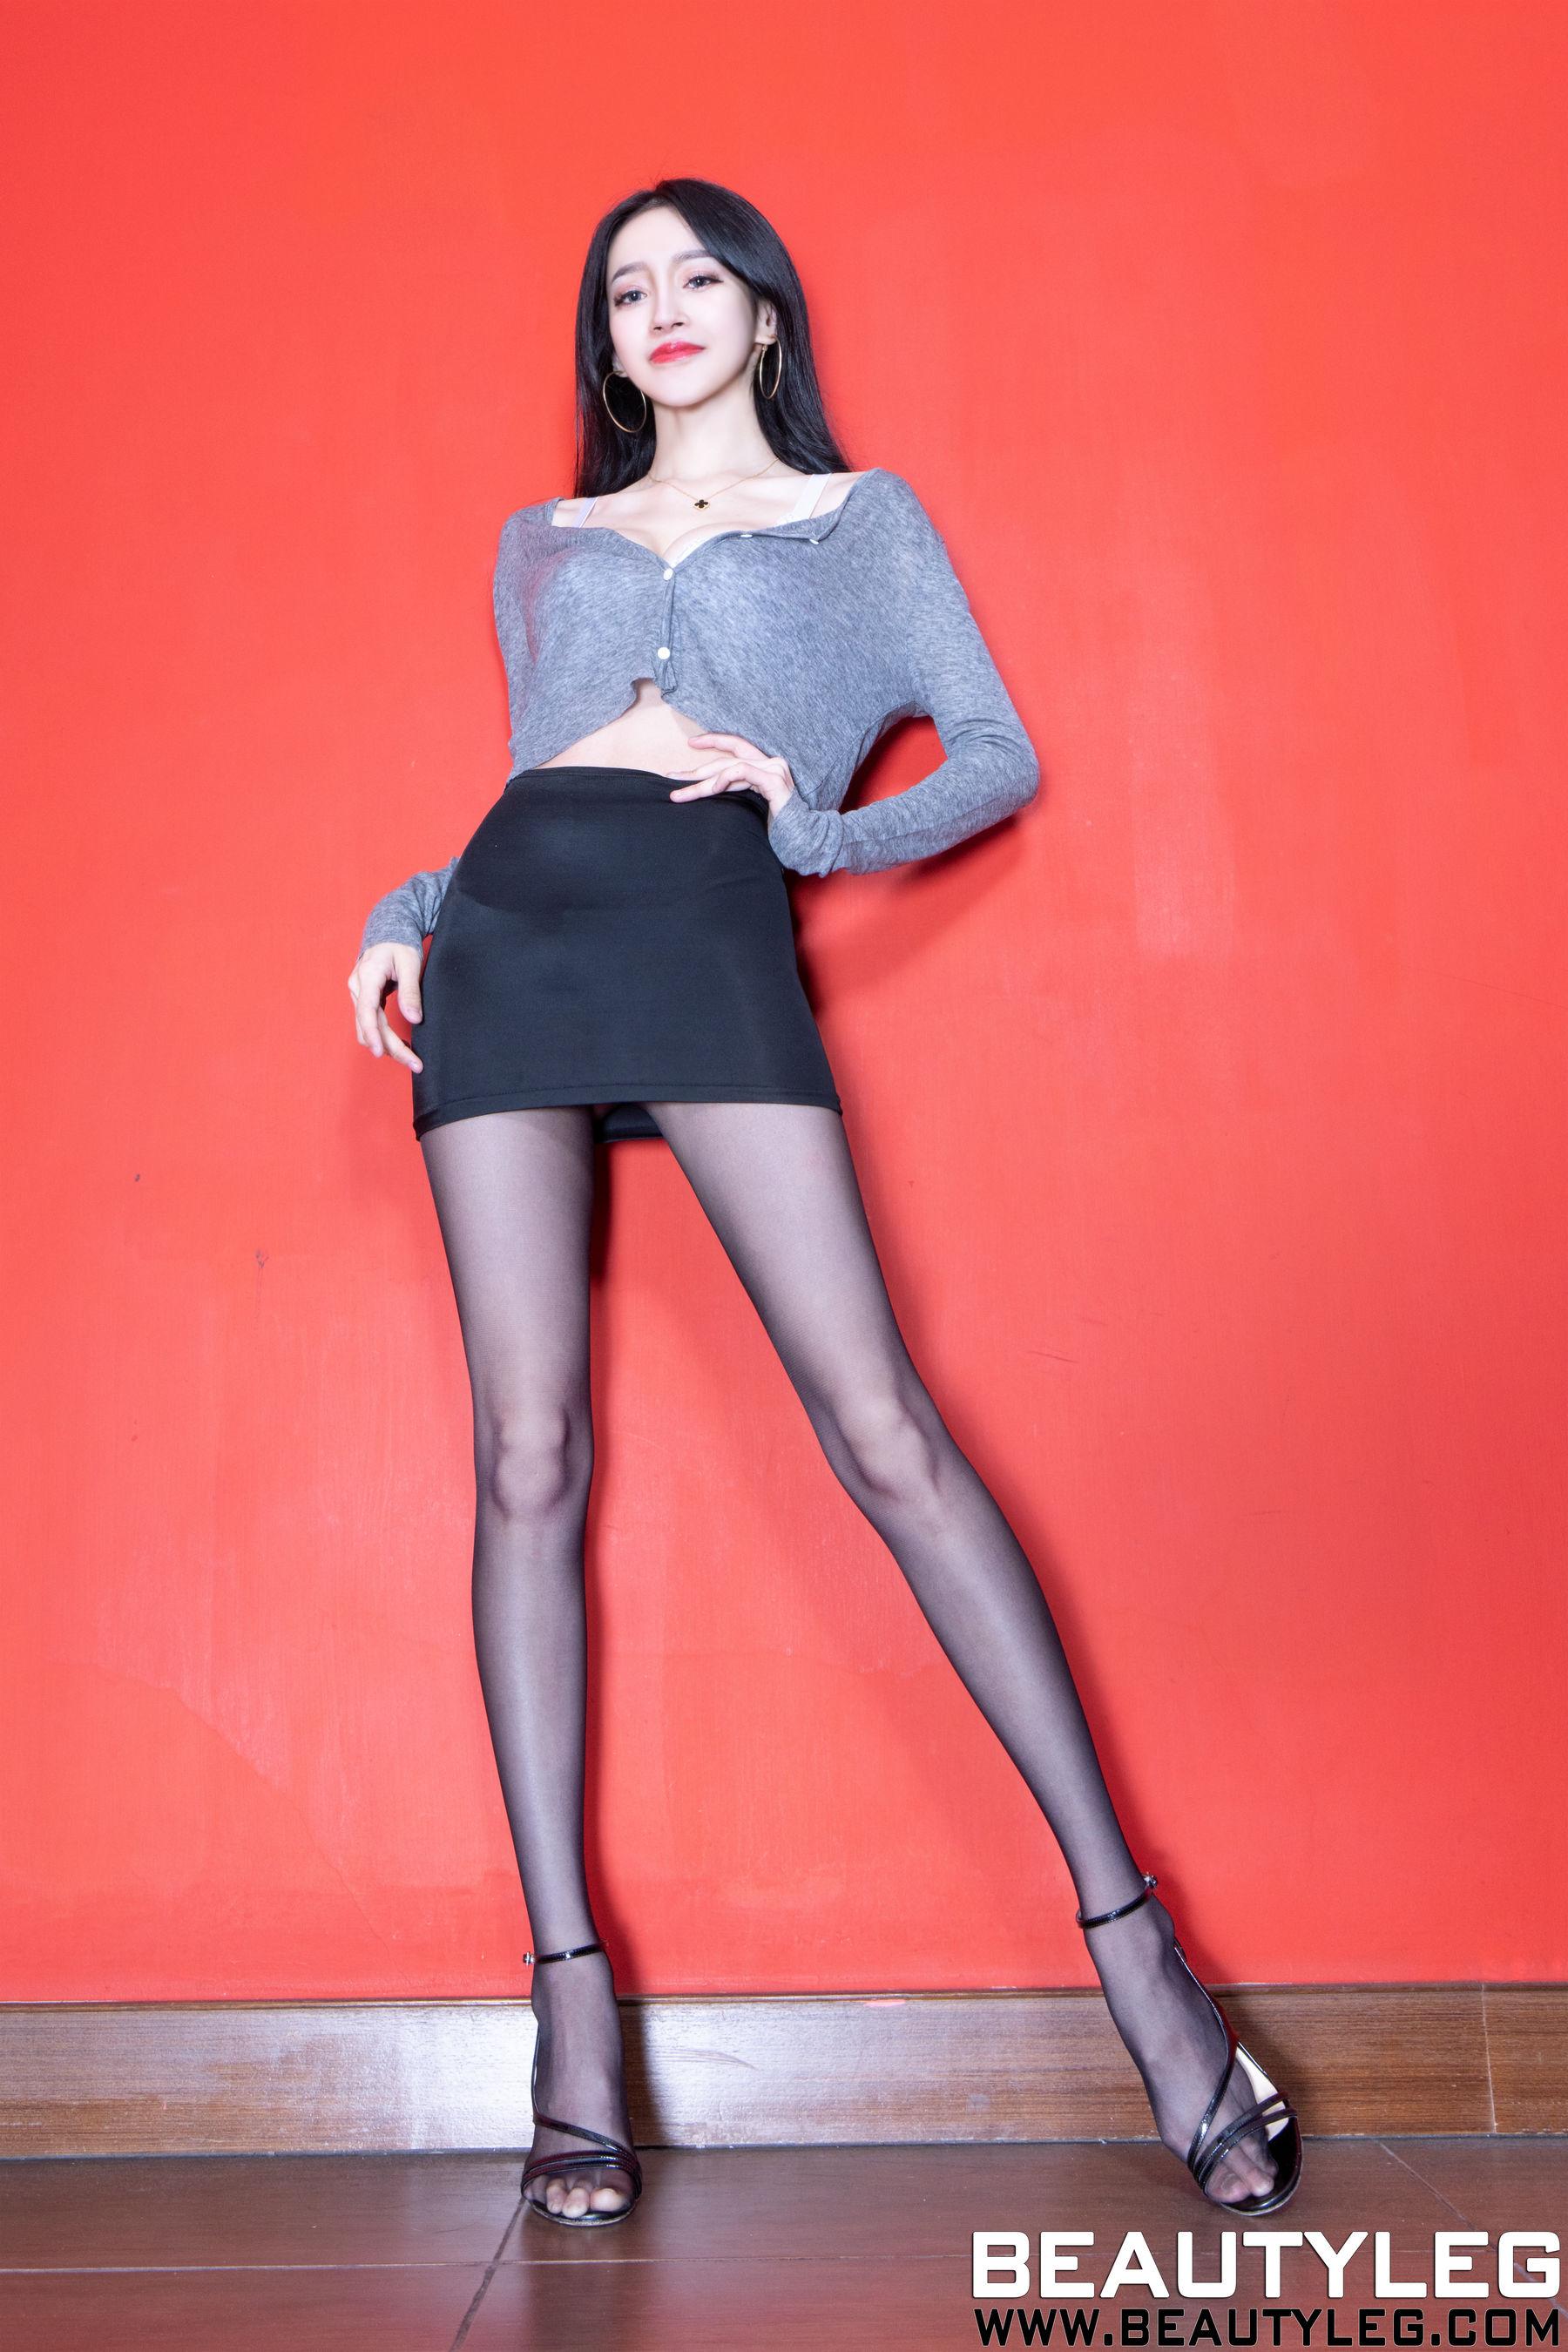 VOL.1839 [Beautyleg]高跟美腿:詹艾葳(腿模Avril,腿模Arvil)超高清个人性感漂亮大图(22P)